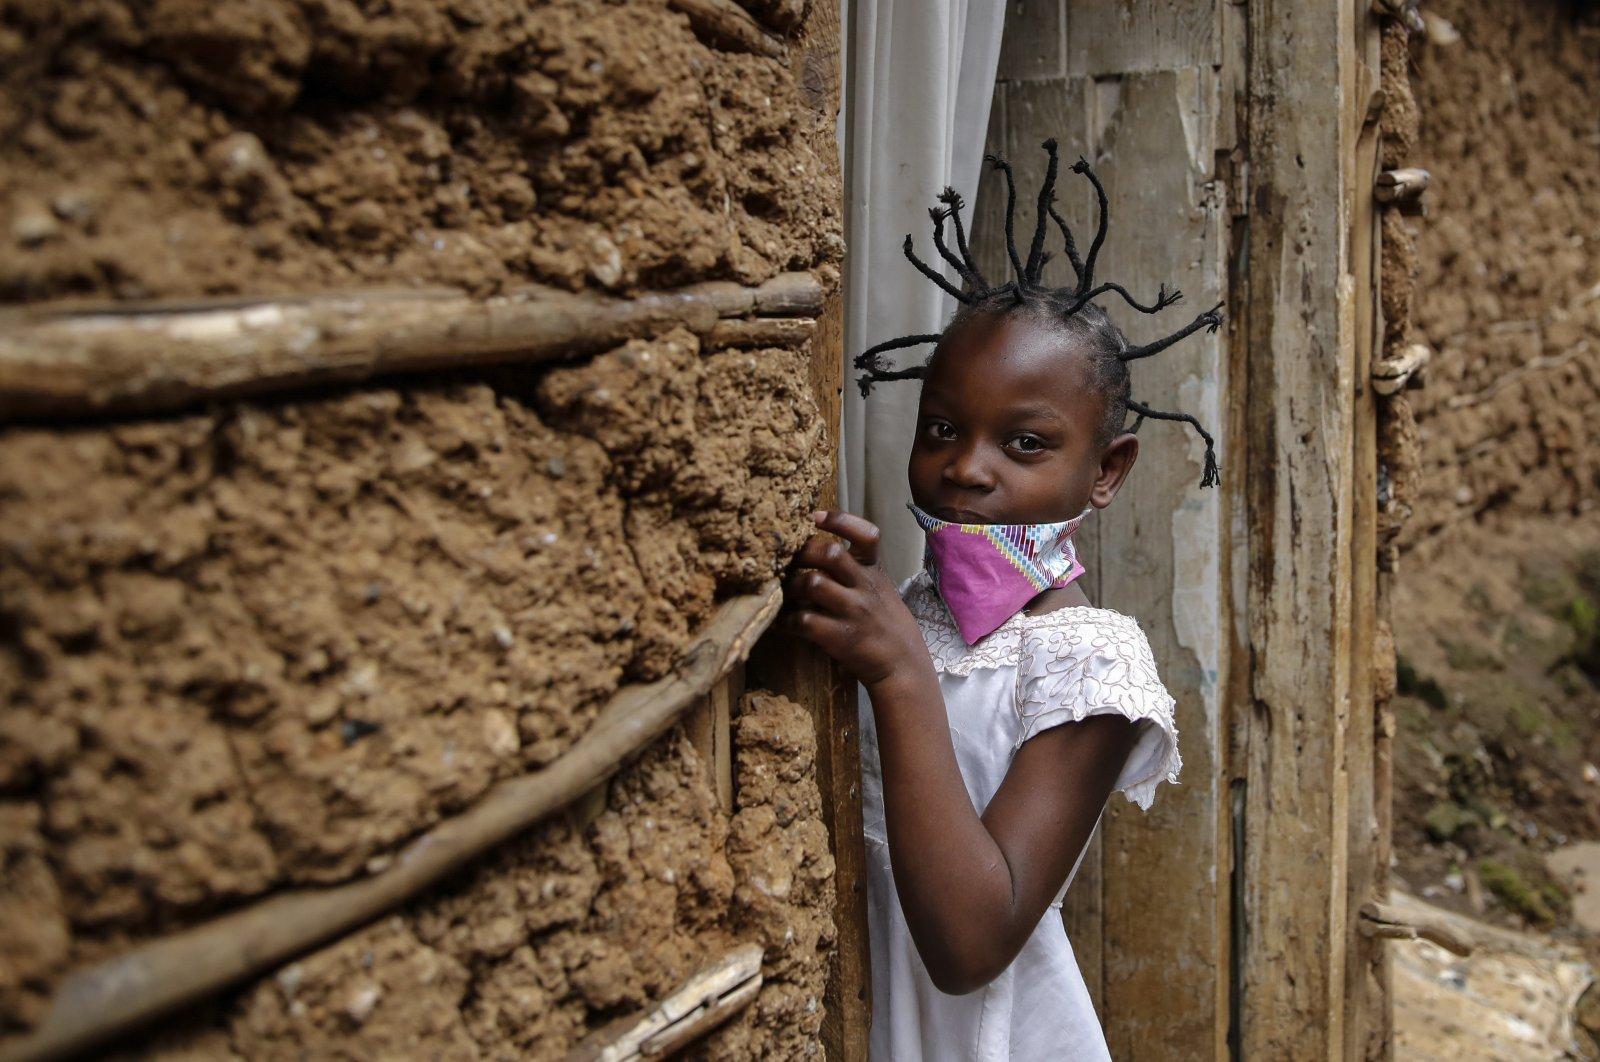 Jane Mbone, 7, arrives home after having her hair styled in the shape of the new coronavirus at the Mama Brayo Beauty Salon in the Kibera slum, or informal settlement, in Nairobi, Kenya, May 3, 2020. (AP Photo)